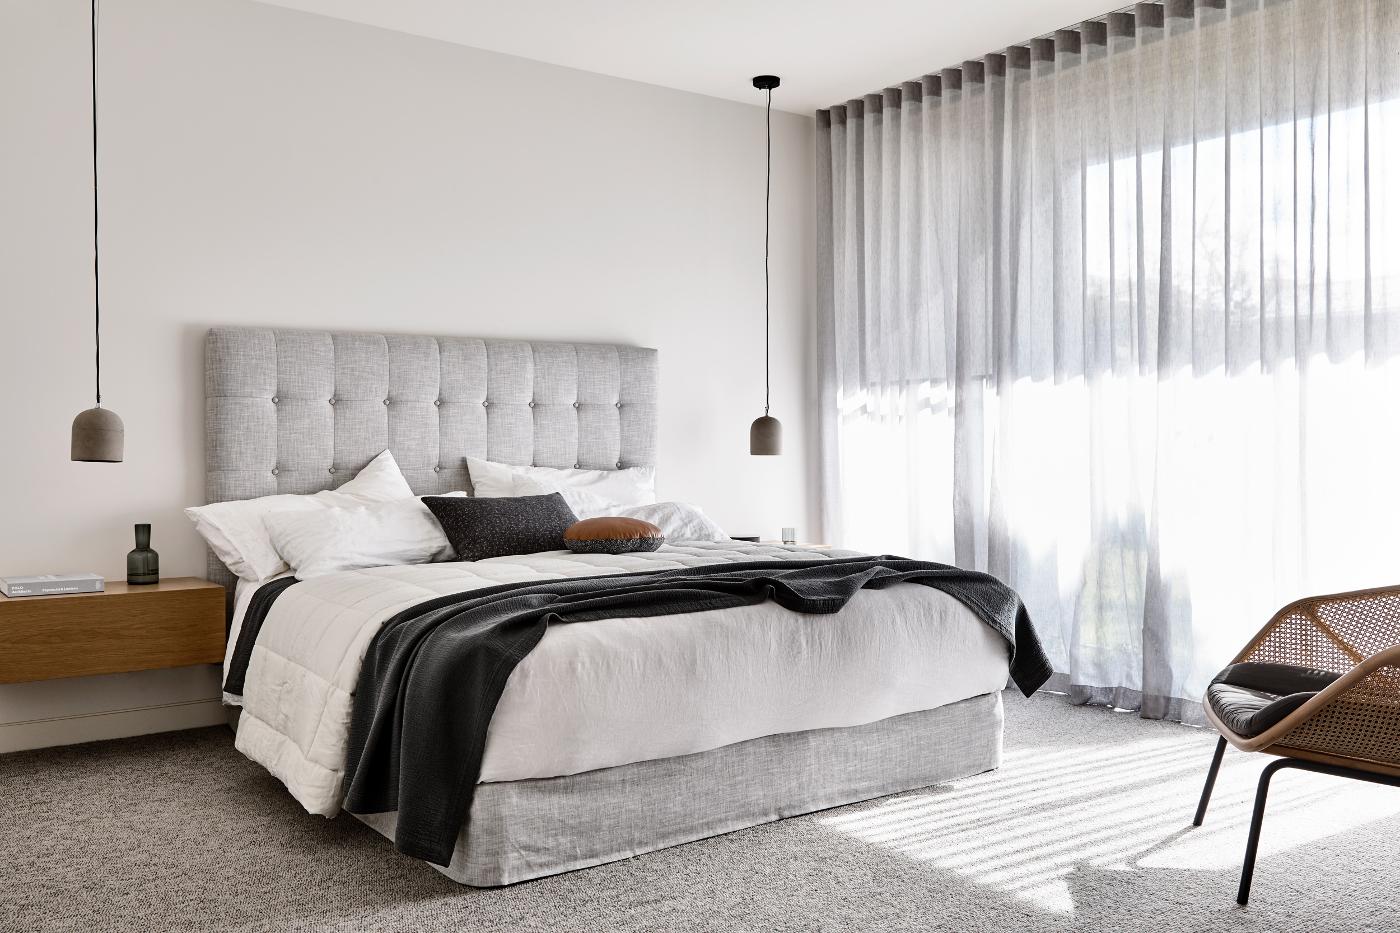 Brighton 5 By Inform Design Architecture Melbourne Vic